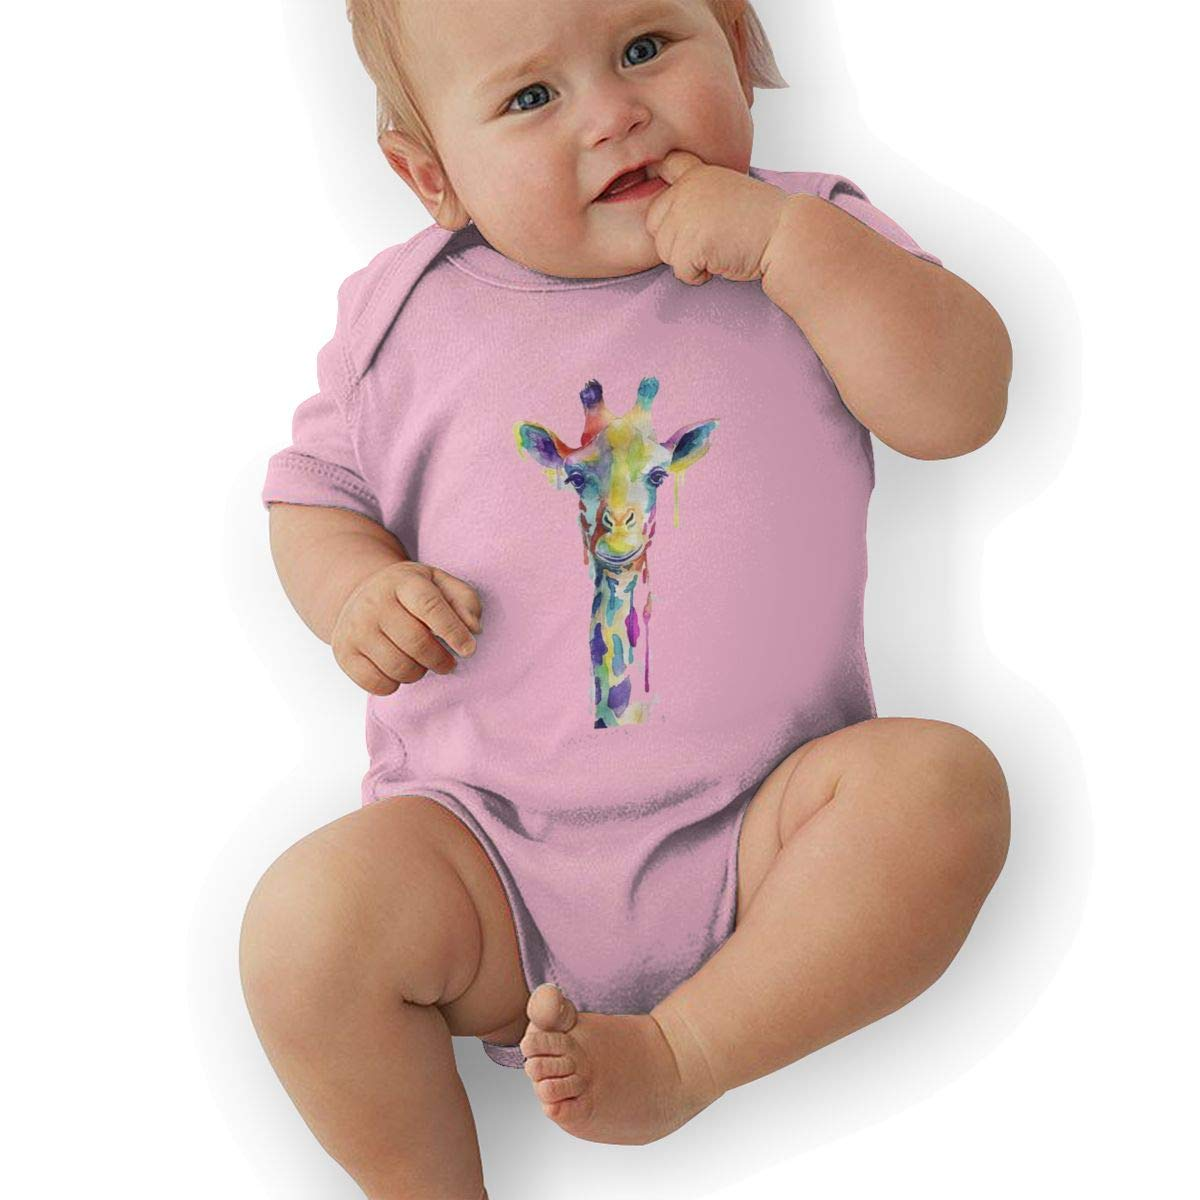 Coollifea Giraffe Waterproof Baby Romper 0-18 Months Newborn Baby Girls Boys Layette Rompers Black